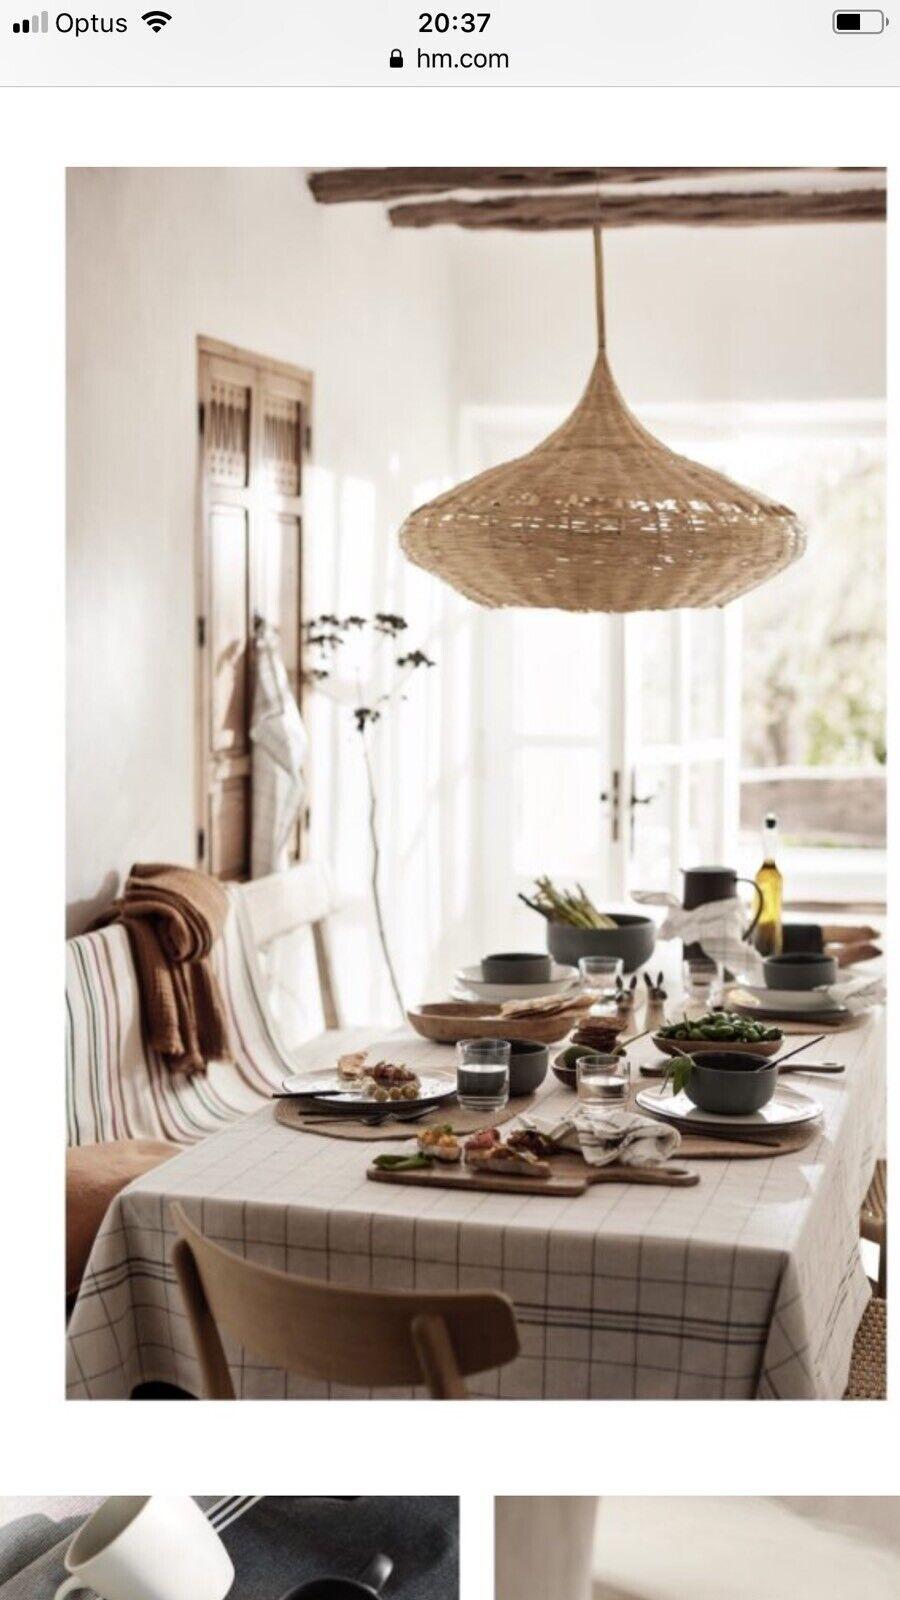 Coffee table coffee tables gumtree australia mandurah area meadow springs 1213805106